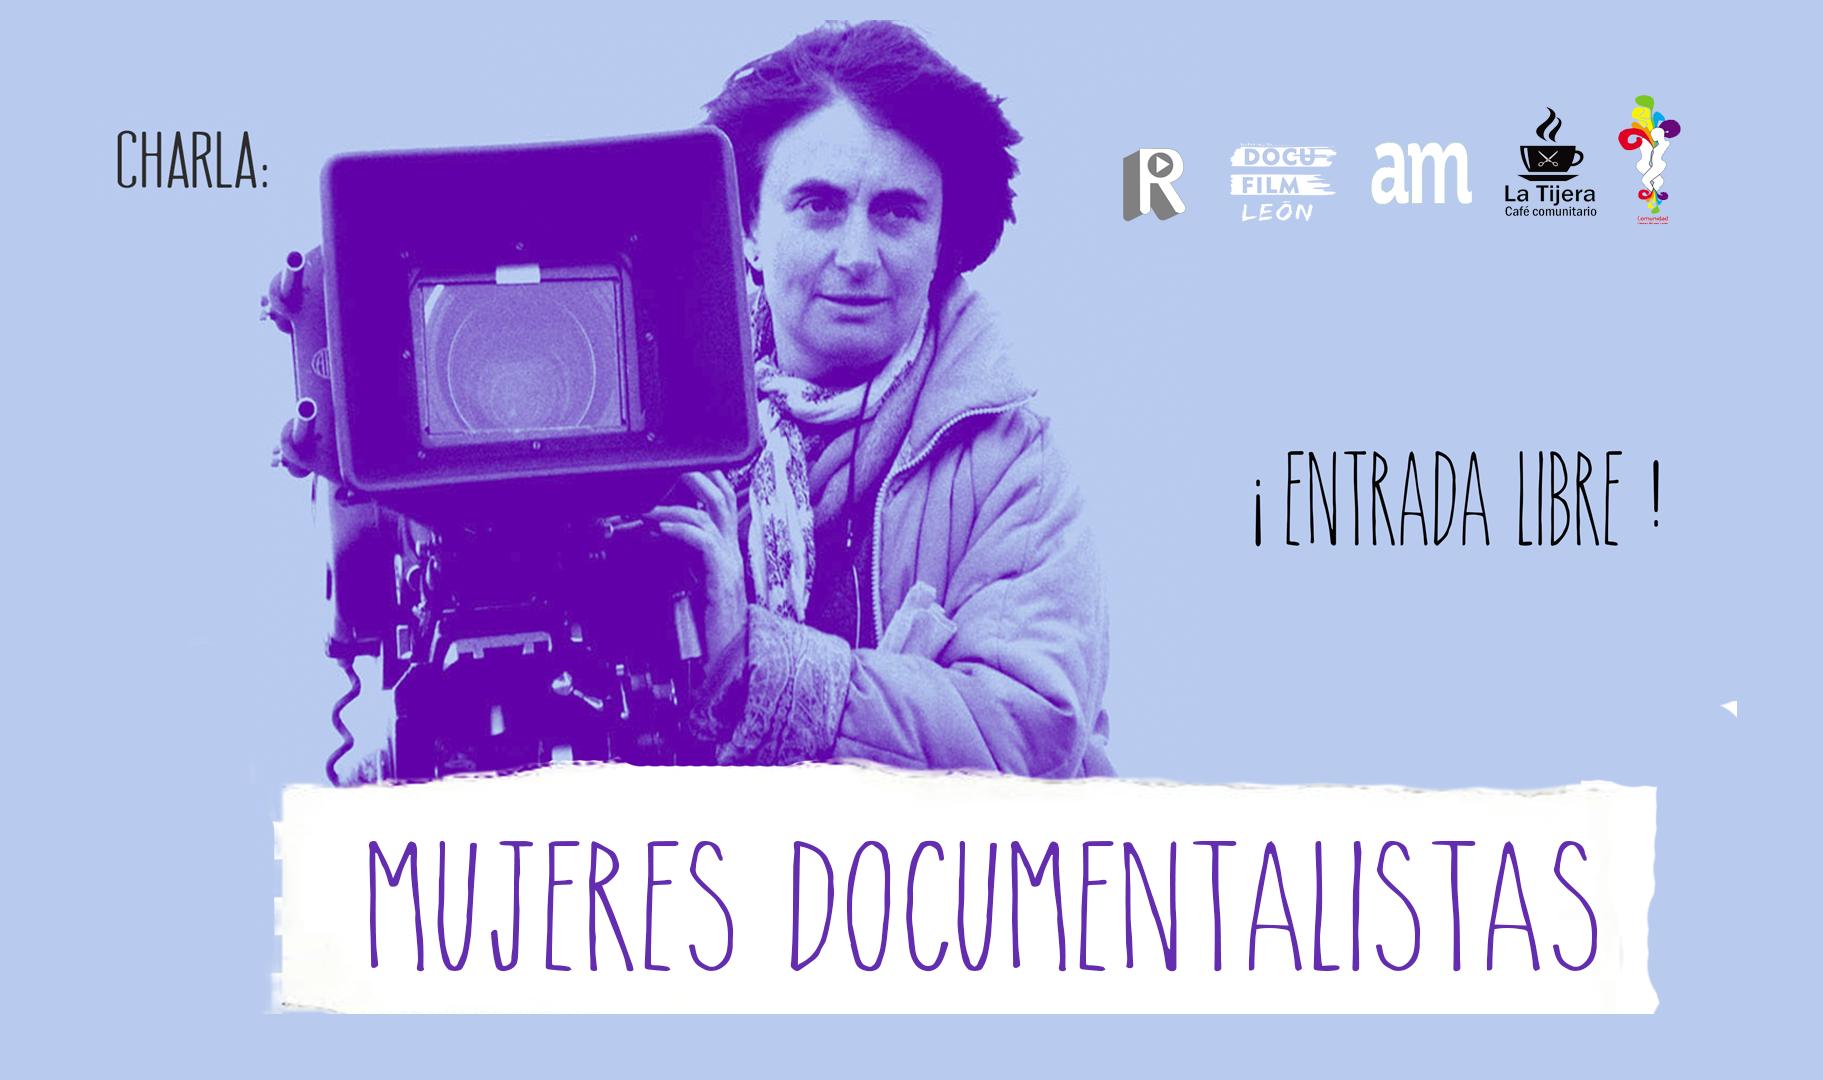 Charla Mujeres Documentalistas